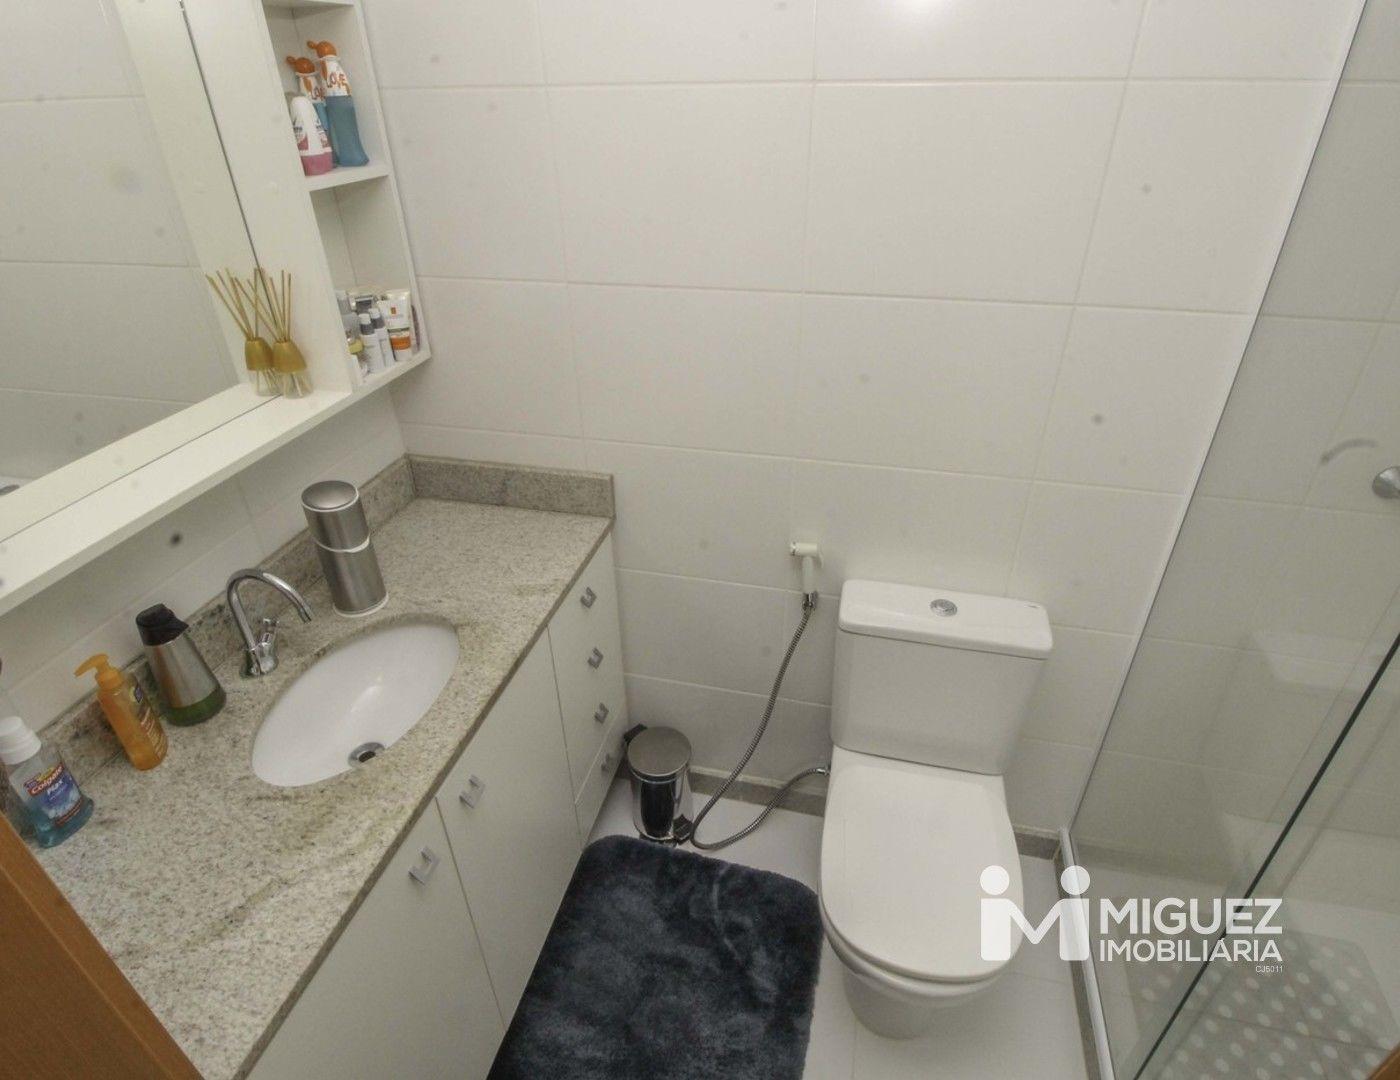 Apartamento, aluguel, Rua do Bispo - Rio Comprido , Rio de janeiro